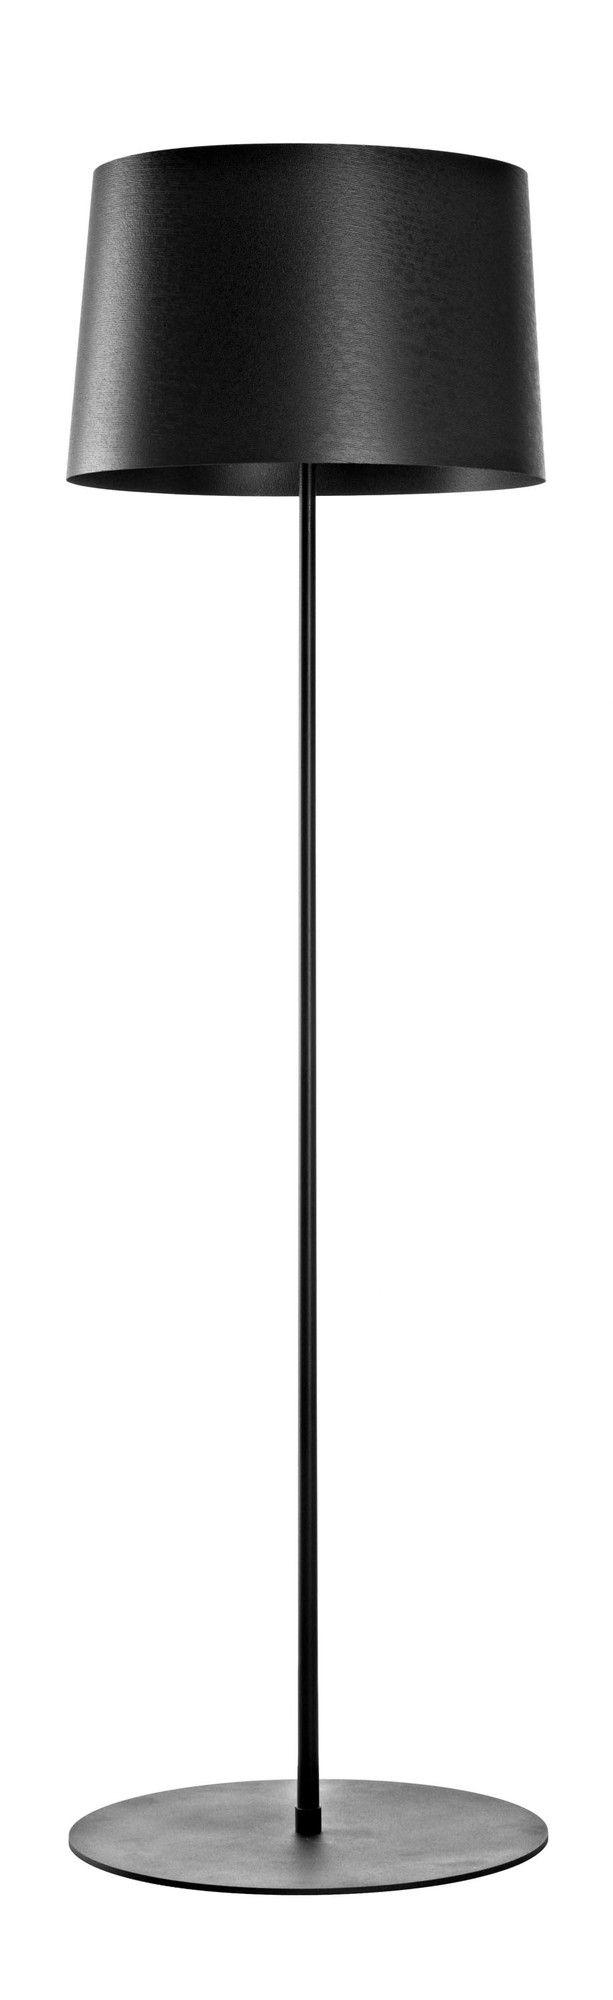 Twiggy Floor Lamp   Foscarini